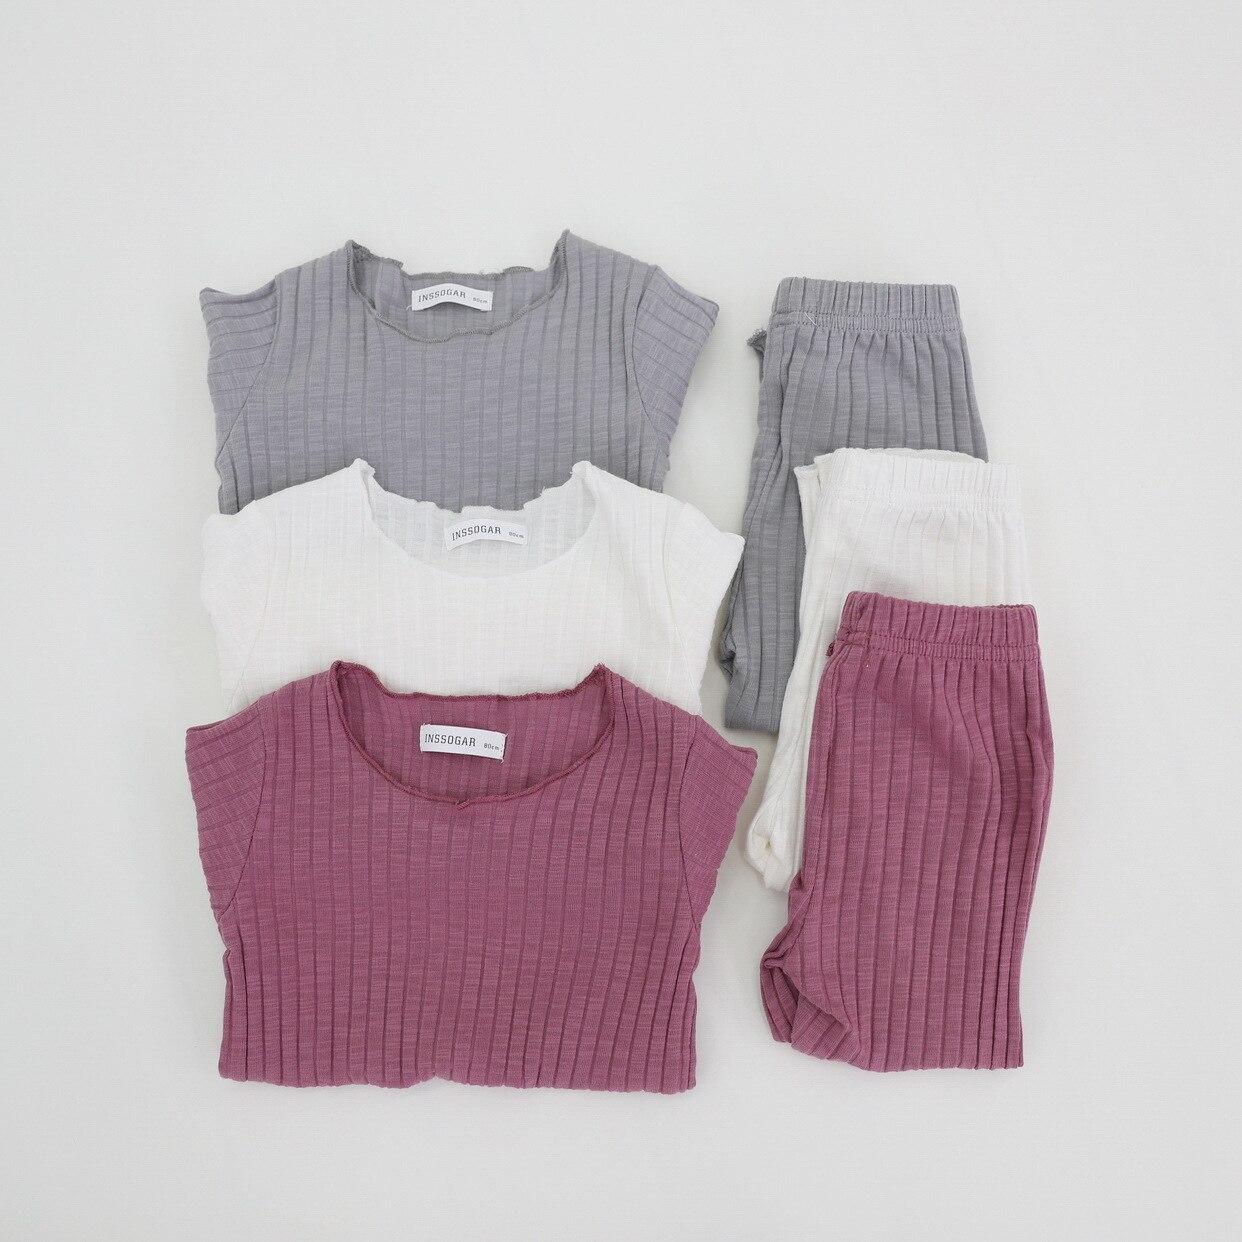 Baby Mädchen Kleidung Anzug T-shirt + Hosen Infant Baby Mädchen Kleidung Stricken Tops Hause Outfits 2 Pcs Set Candy Farbe 1-8 Jahre Großhandel